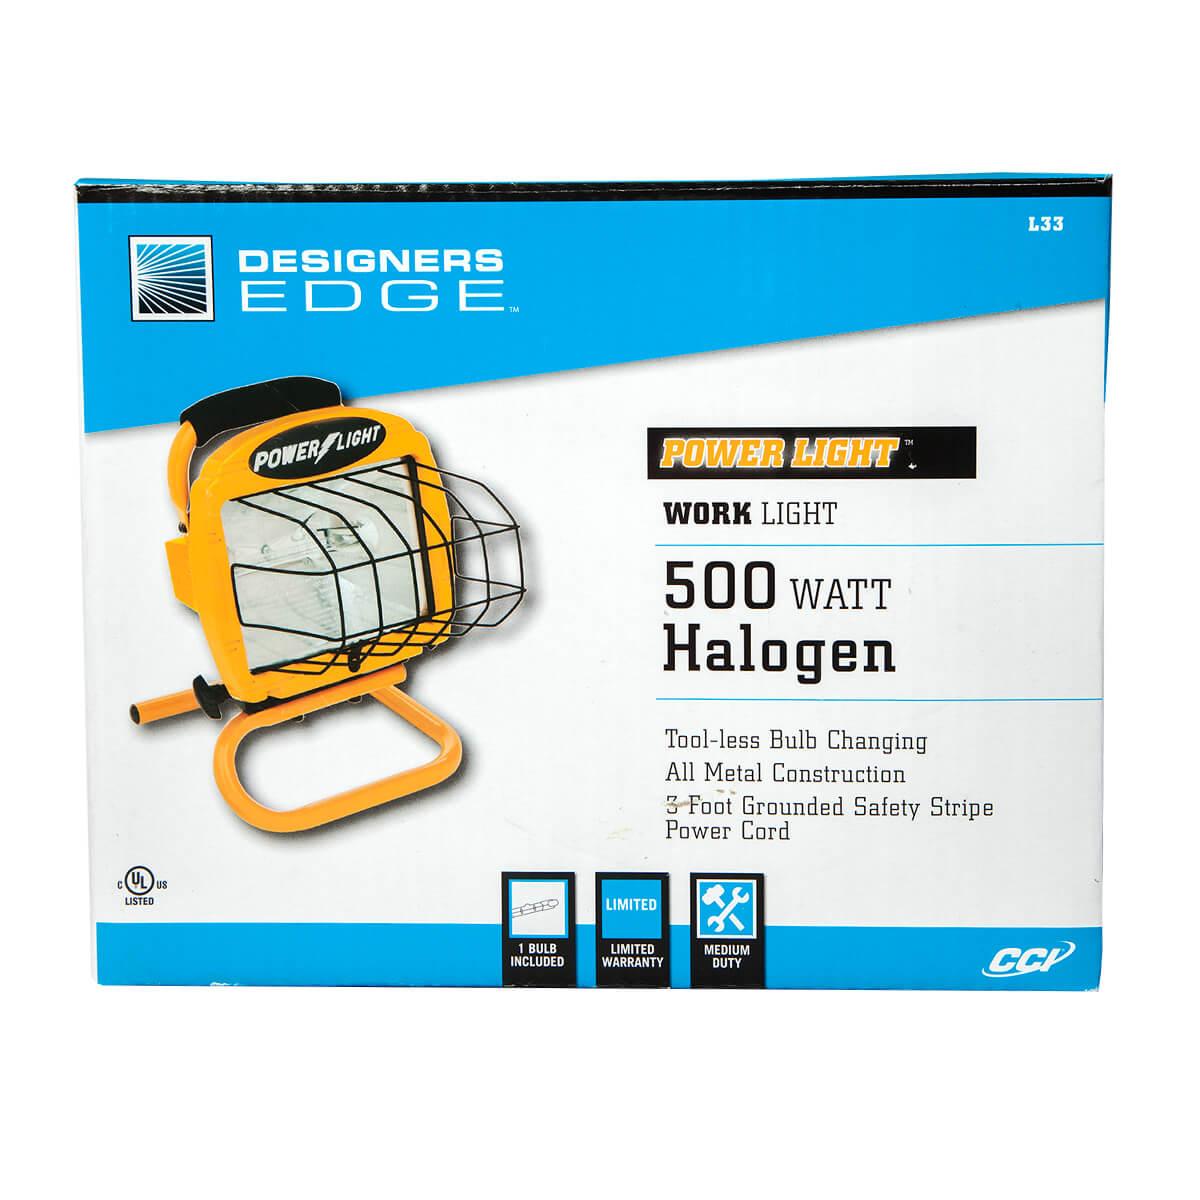 500W Halogen Portable Work Light